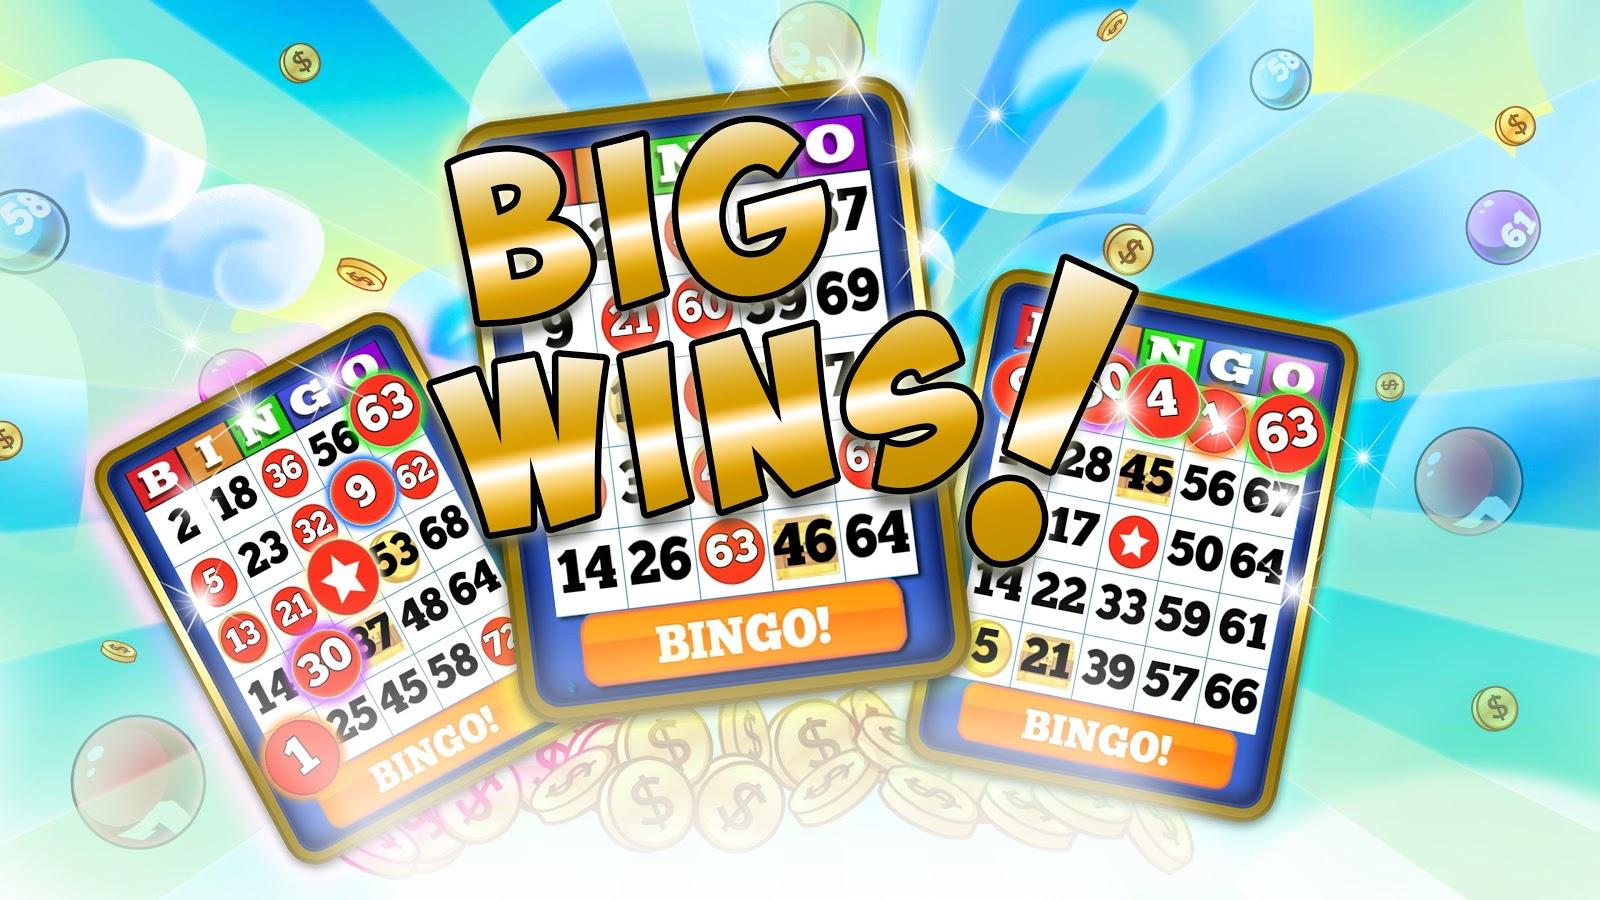 Bingo Heaven Free Bingo Game Android Apps On Google Play